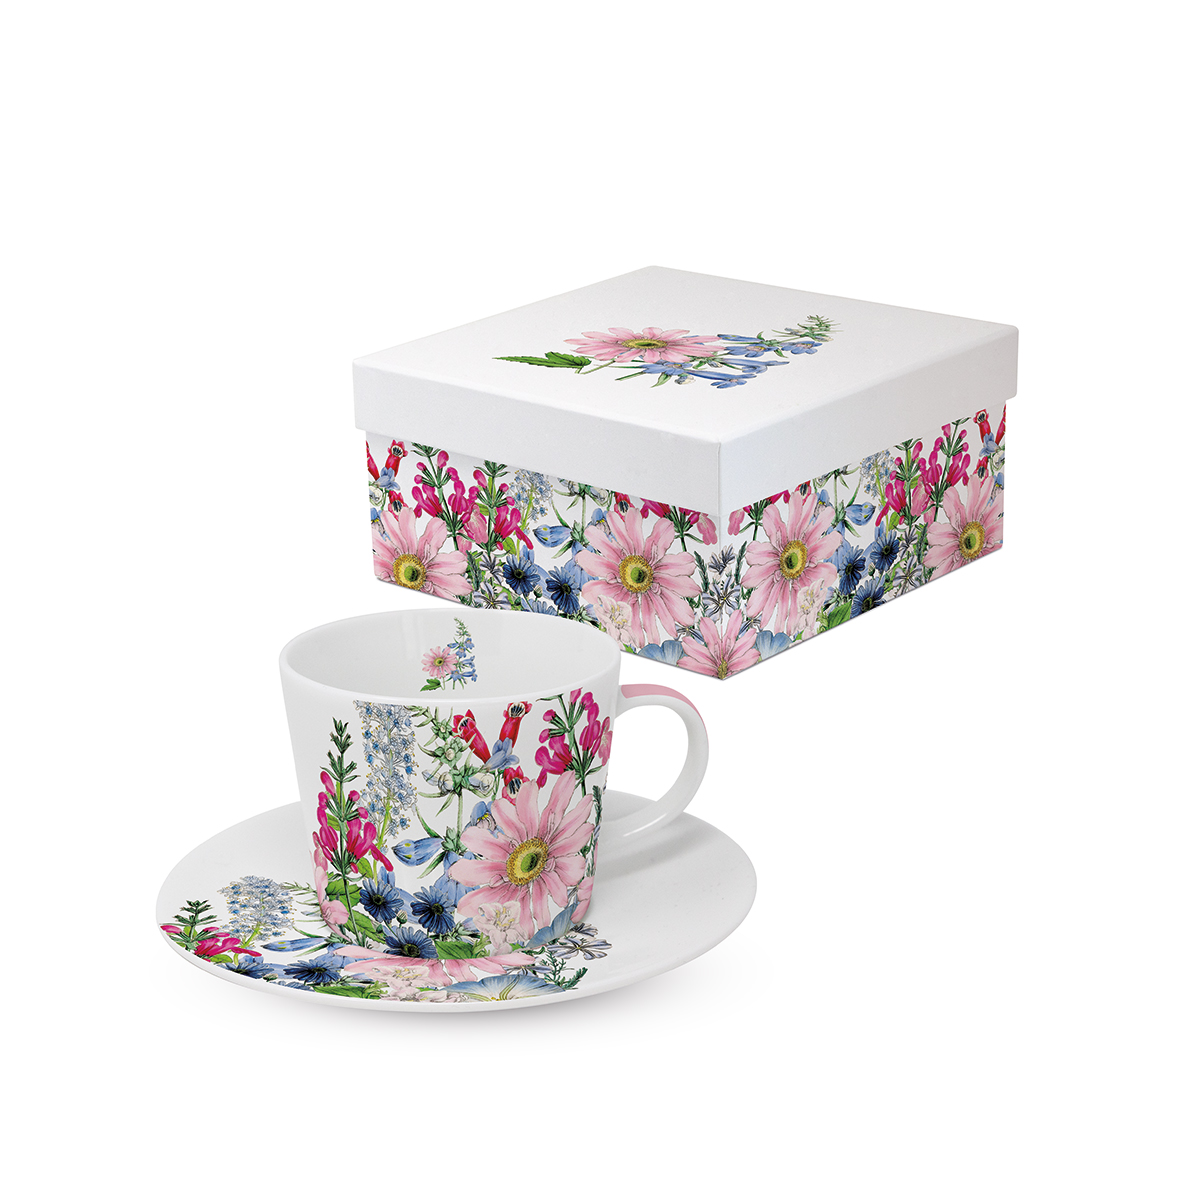 Trend Espresso GB Floriculture